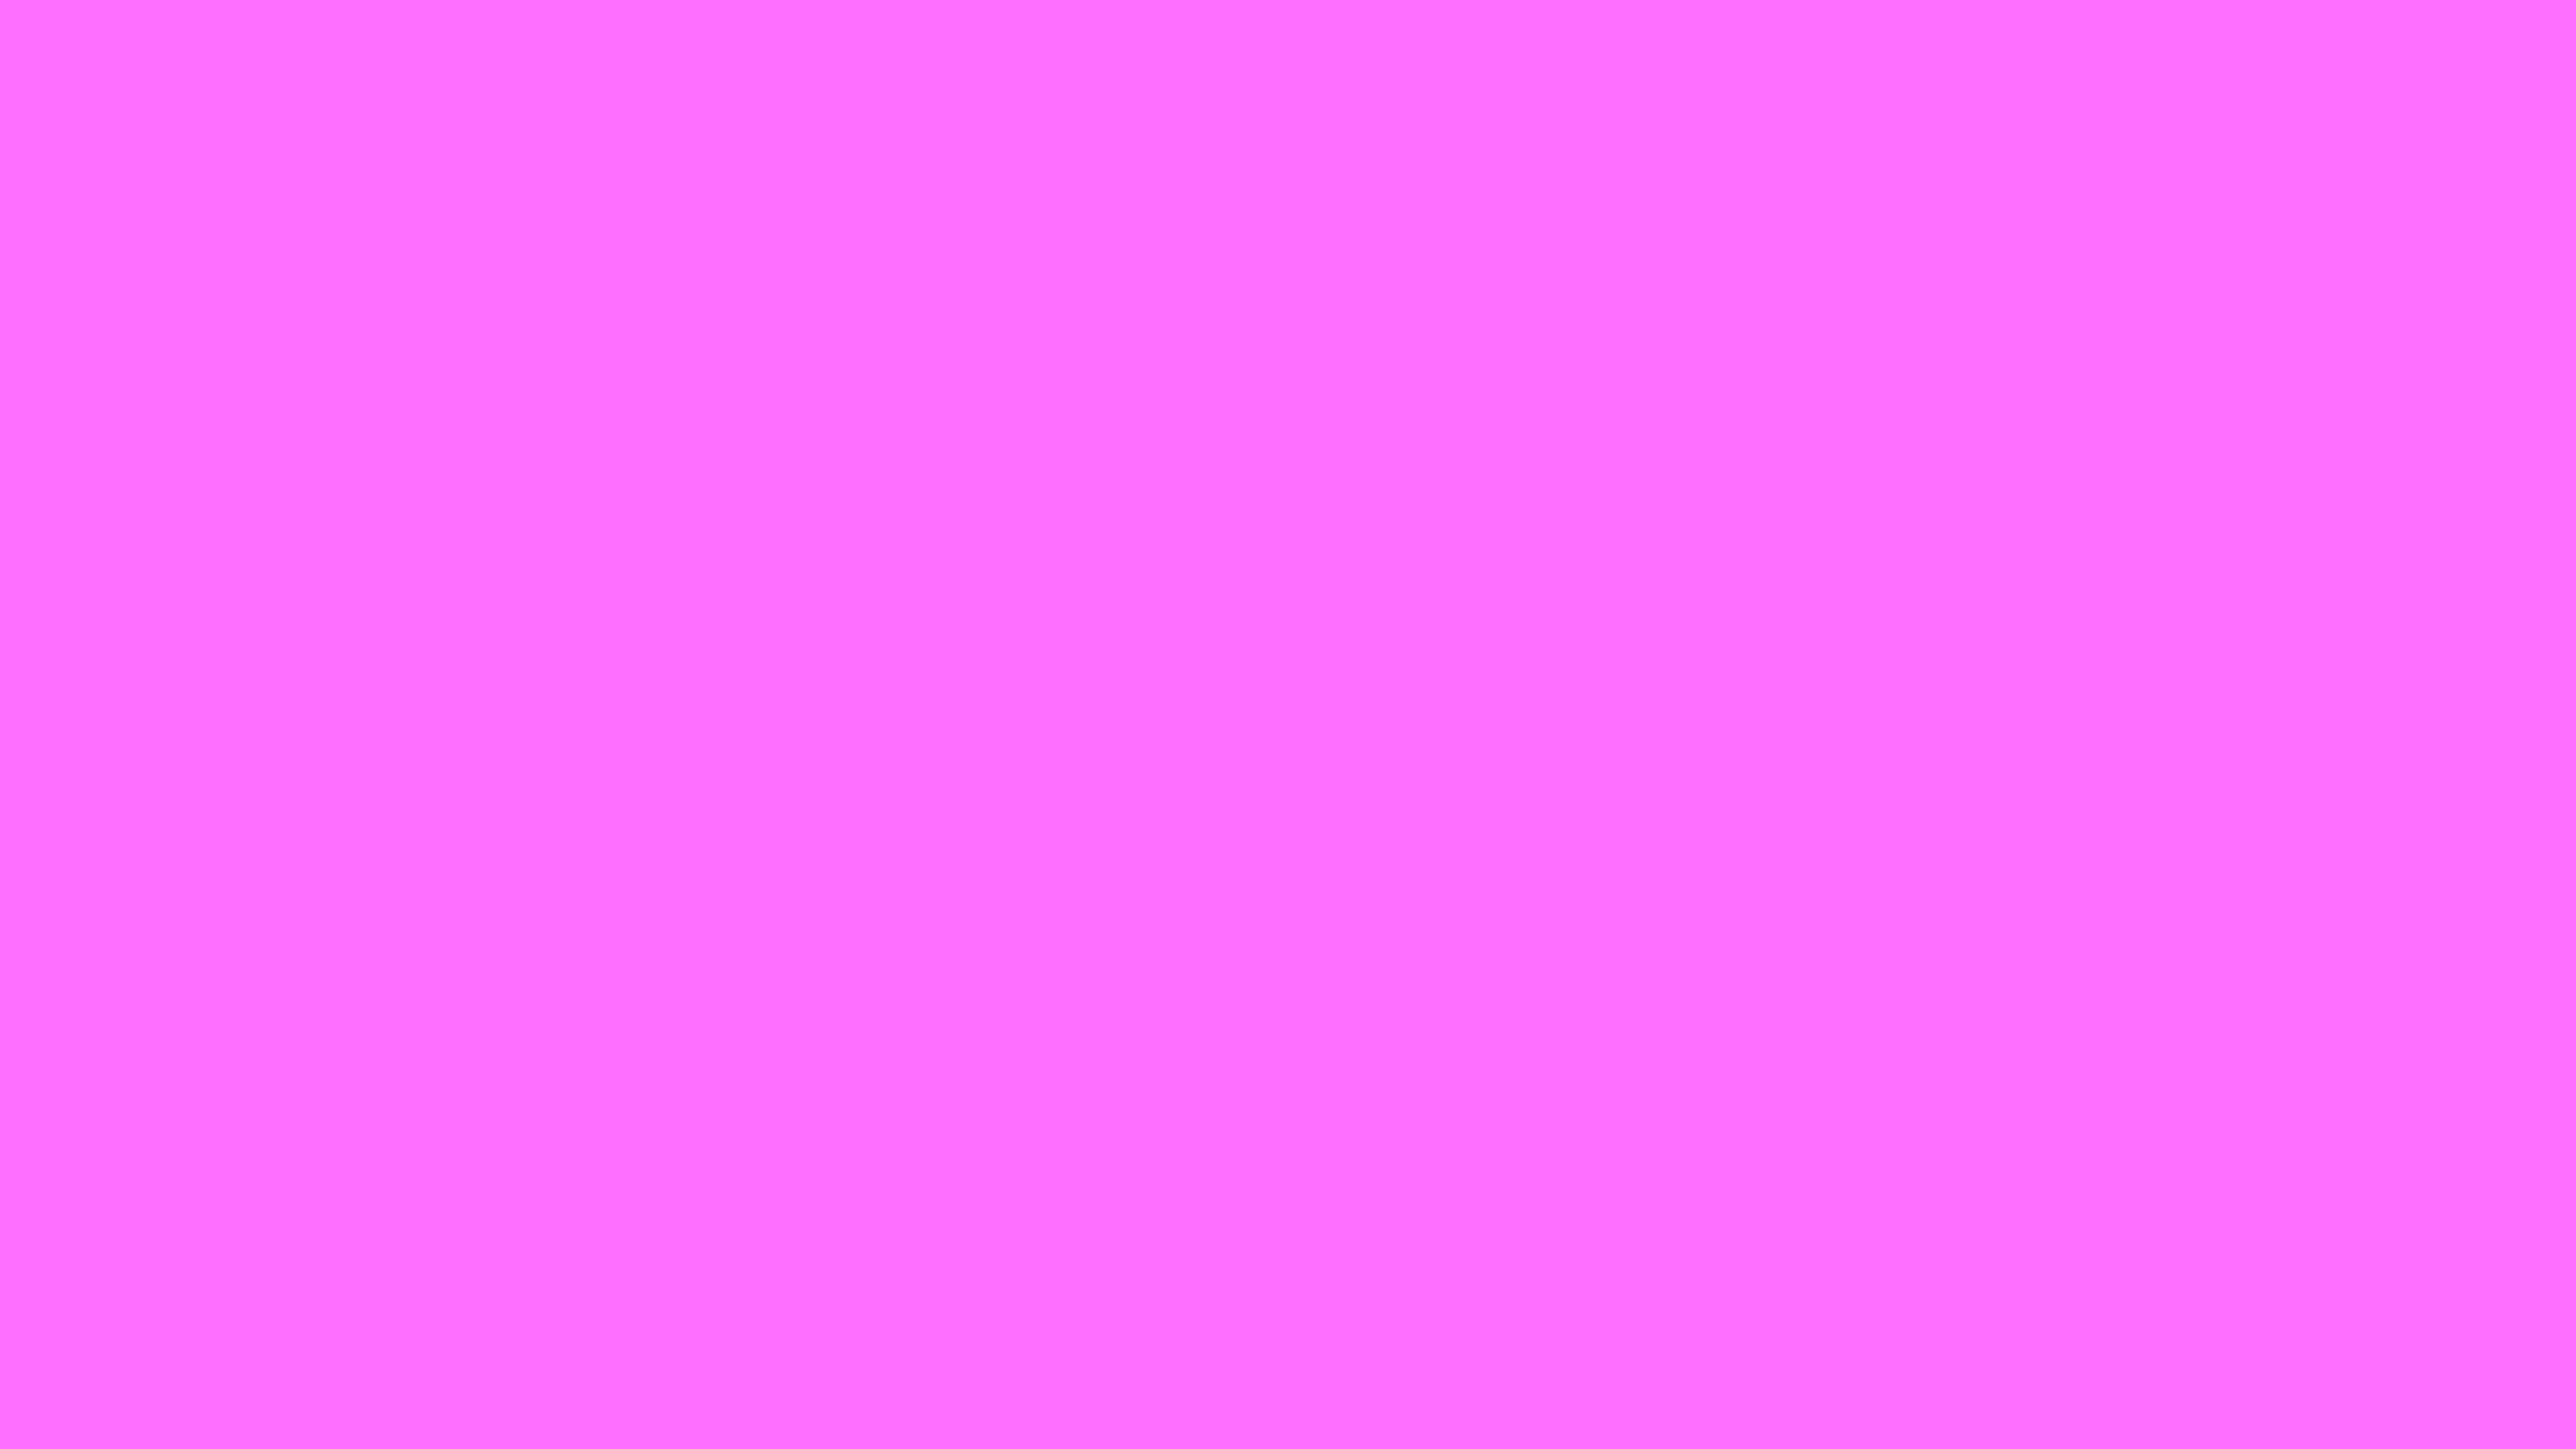 5120x2880 Shocking Pink Crayola Solid Color Background